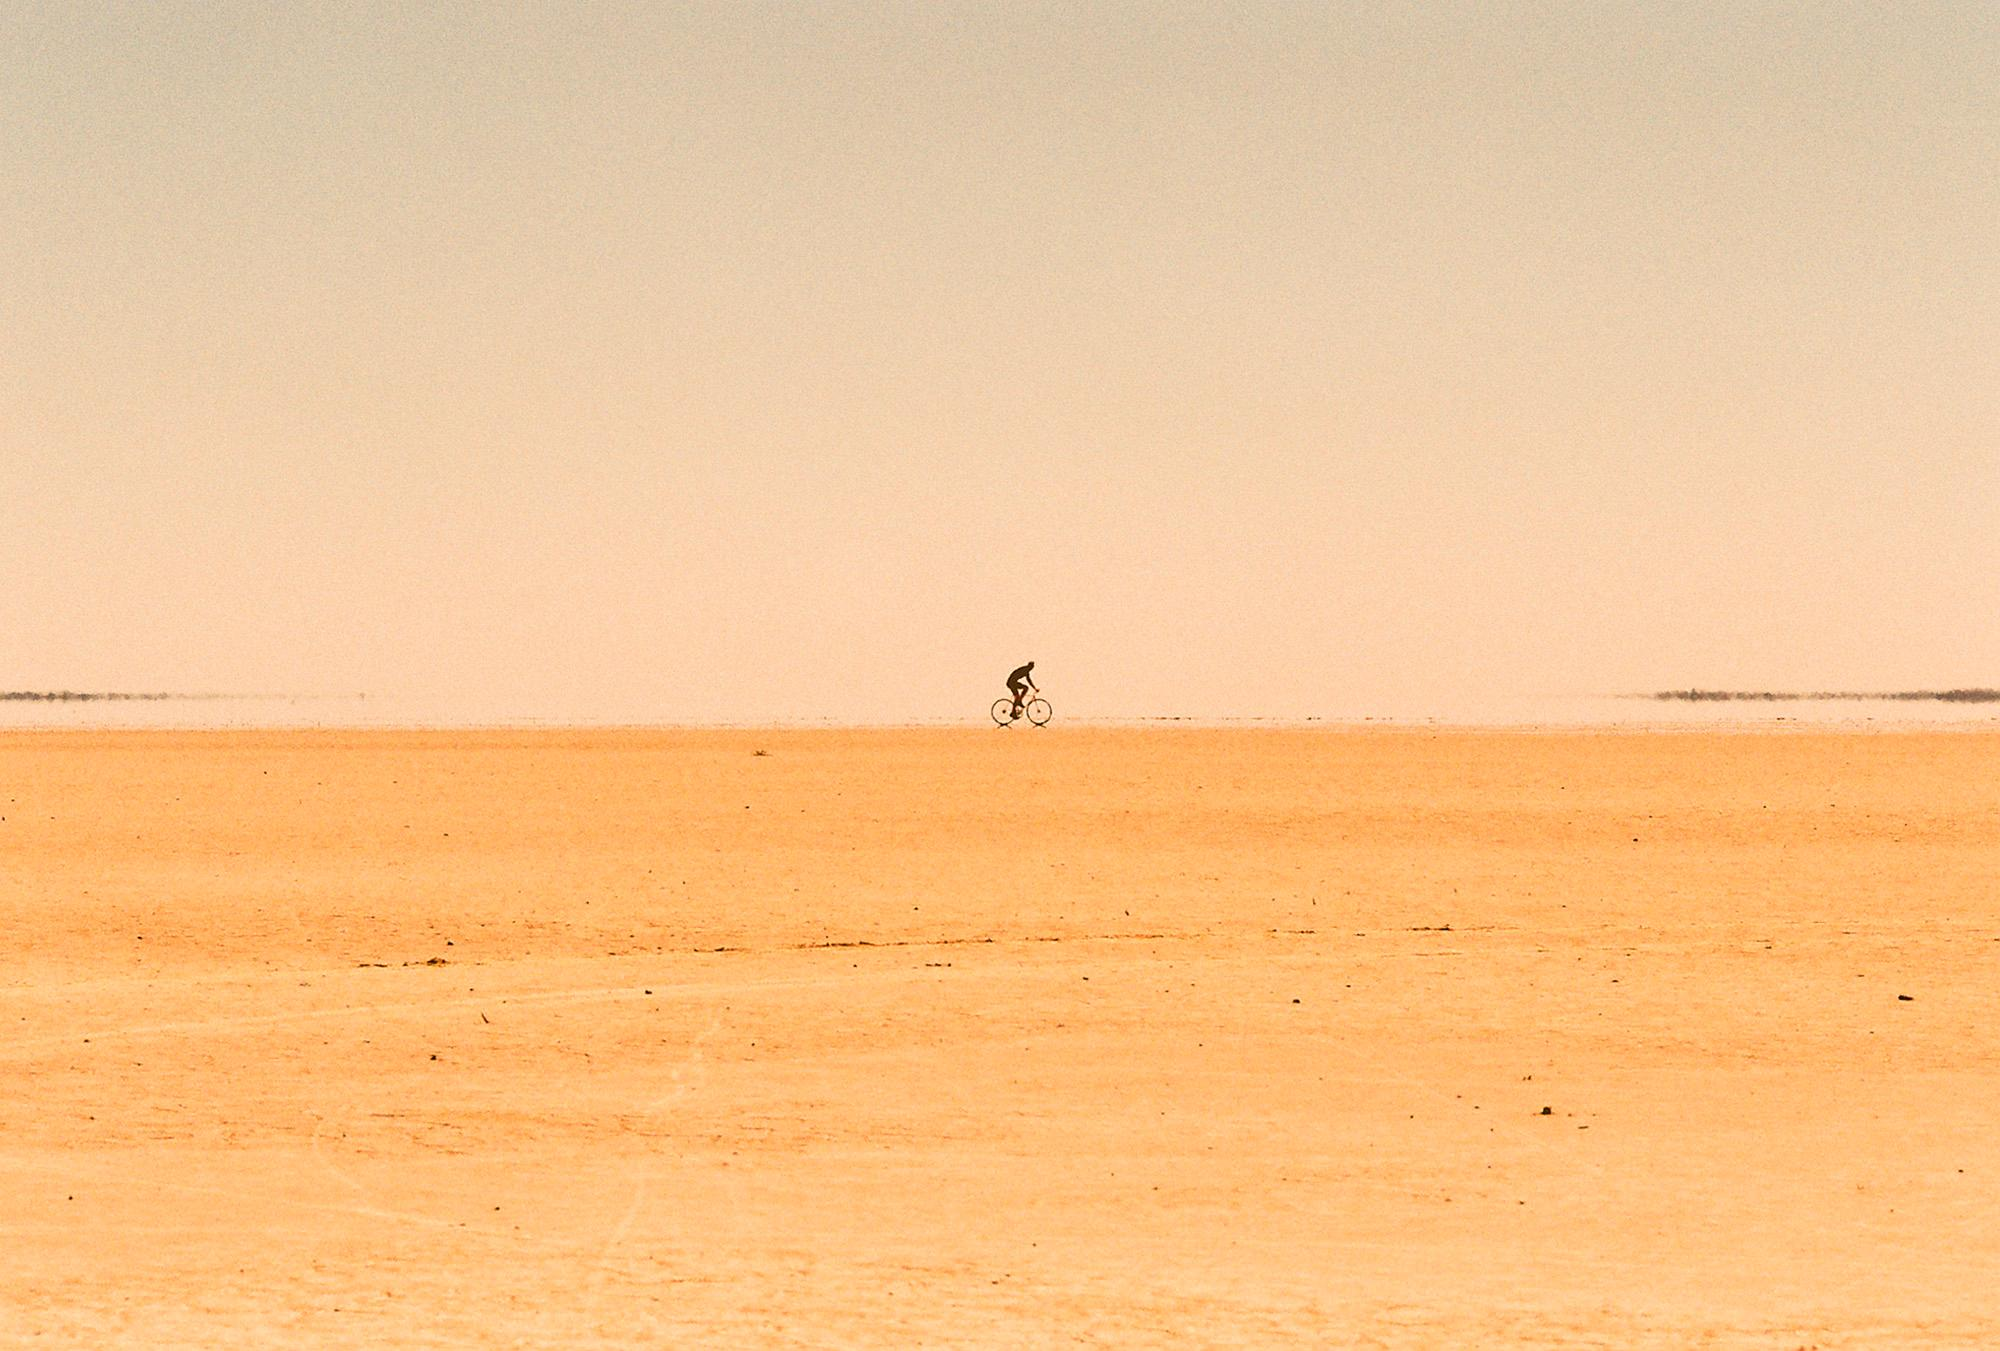 Dreams of #trackpan. Verneukpan, 2016. Shot on 35mm film.